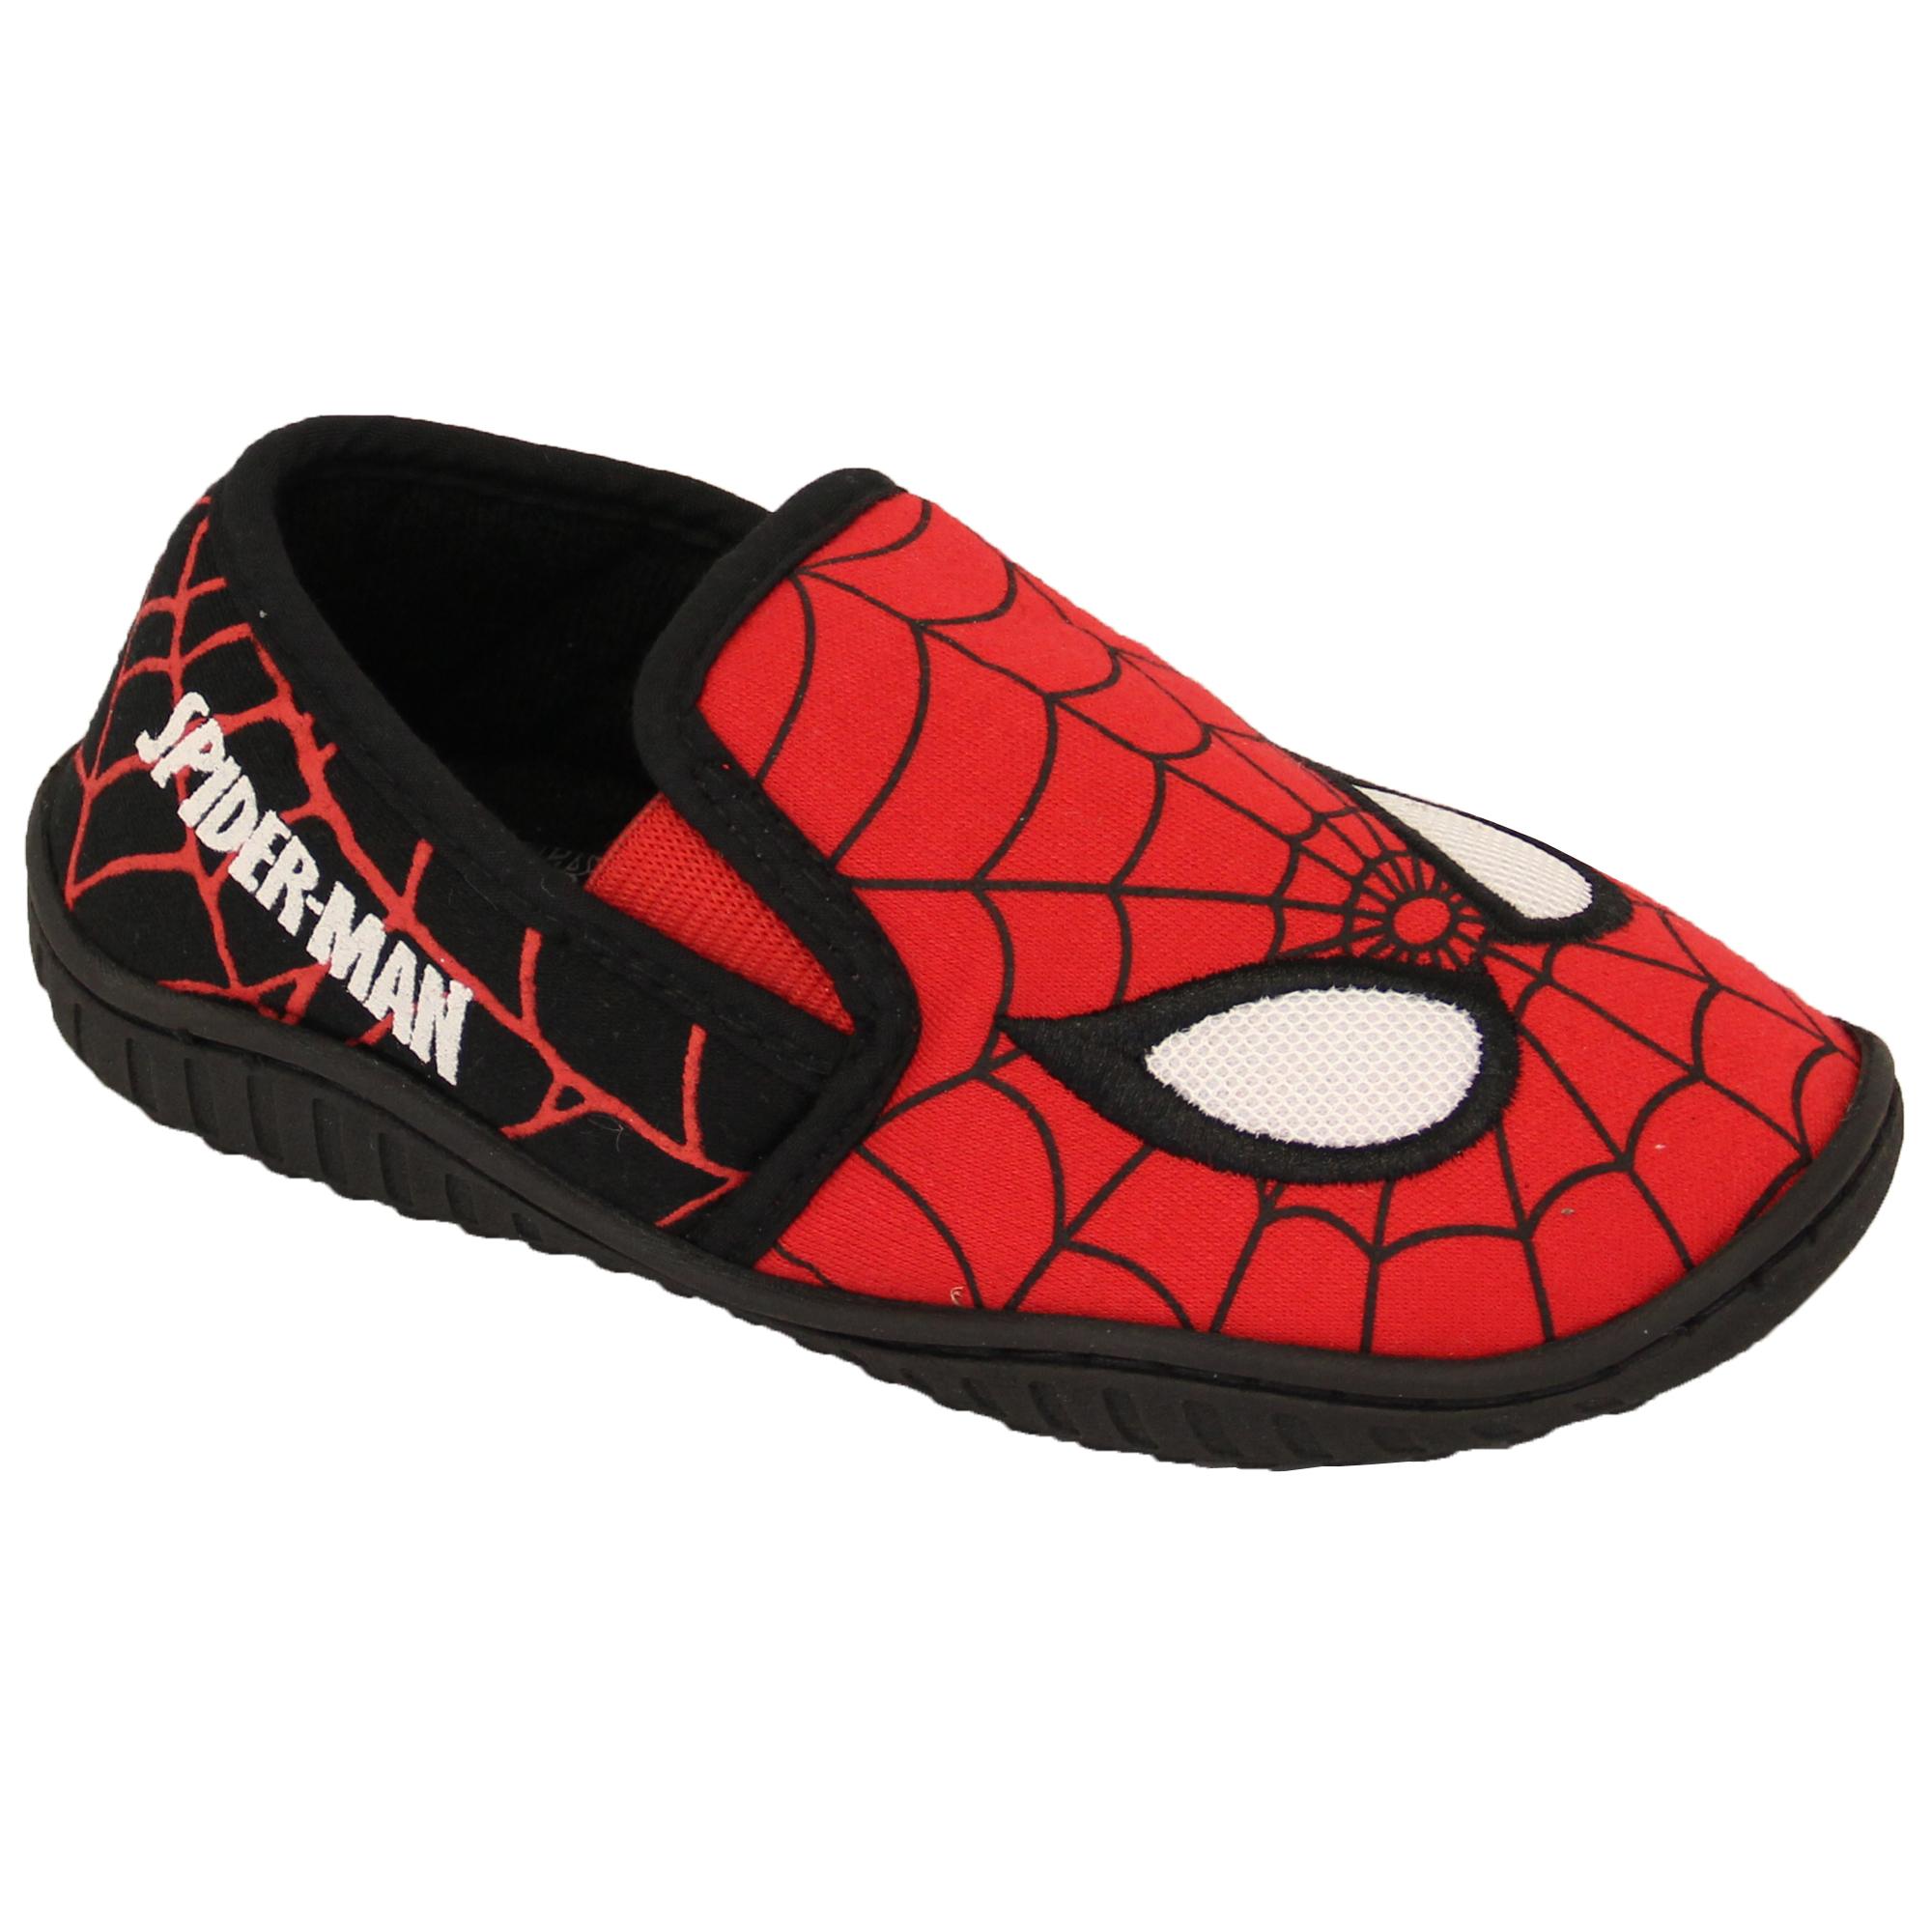 Boys-Girls-Shoes-Minion-Kids-Trainers-Star-Wars-Disney-Spiderman-Slipper thumbnail 32